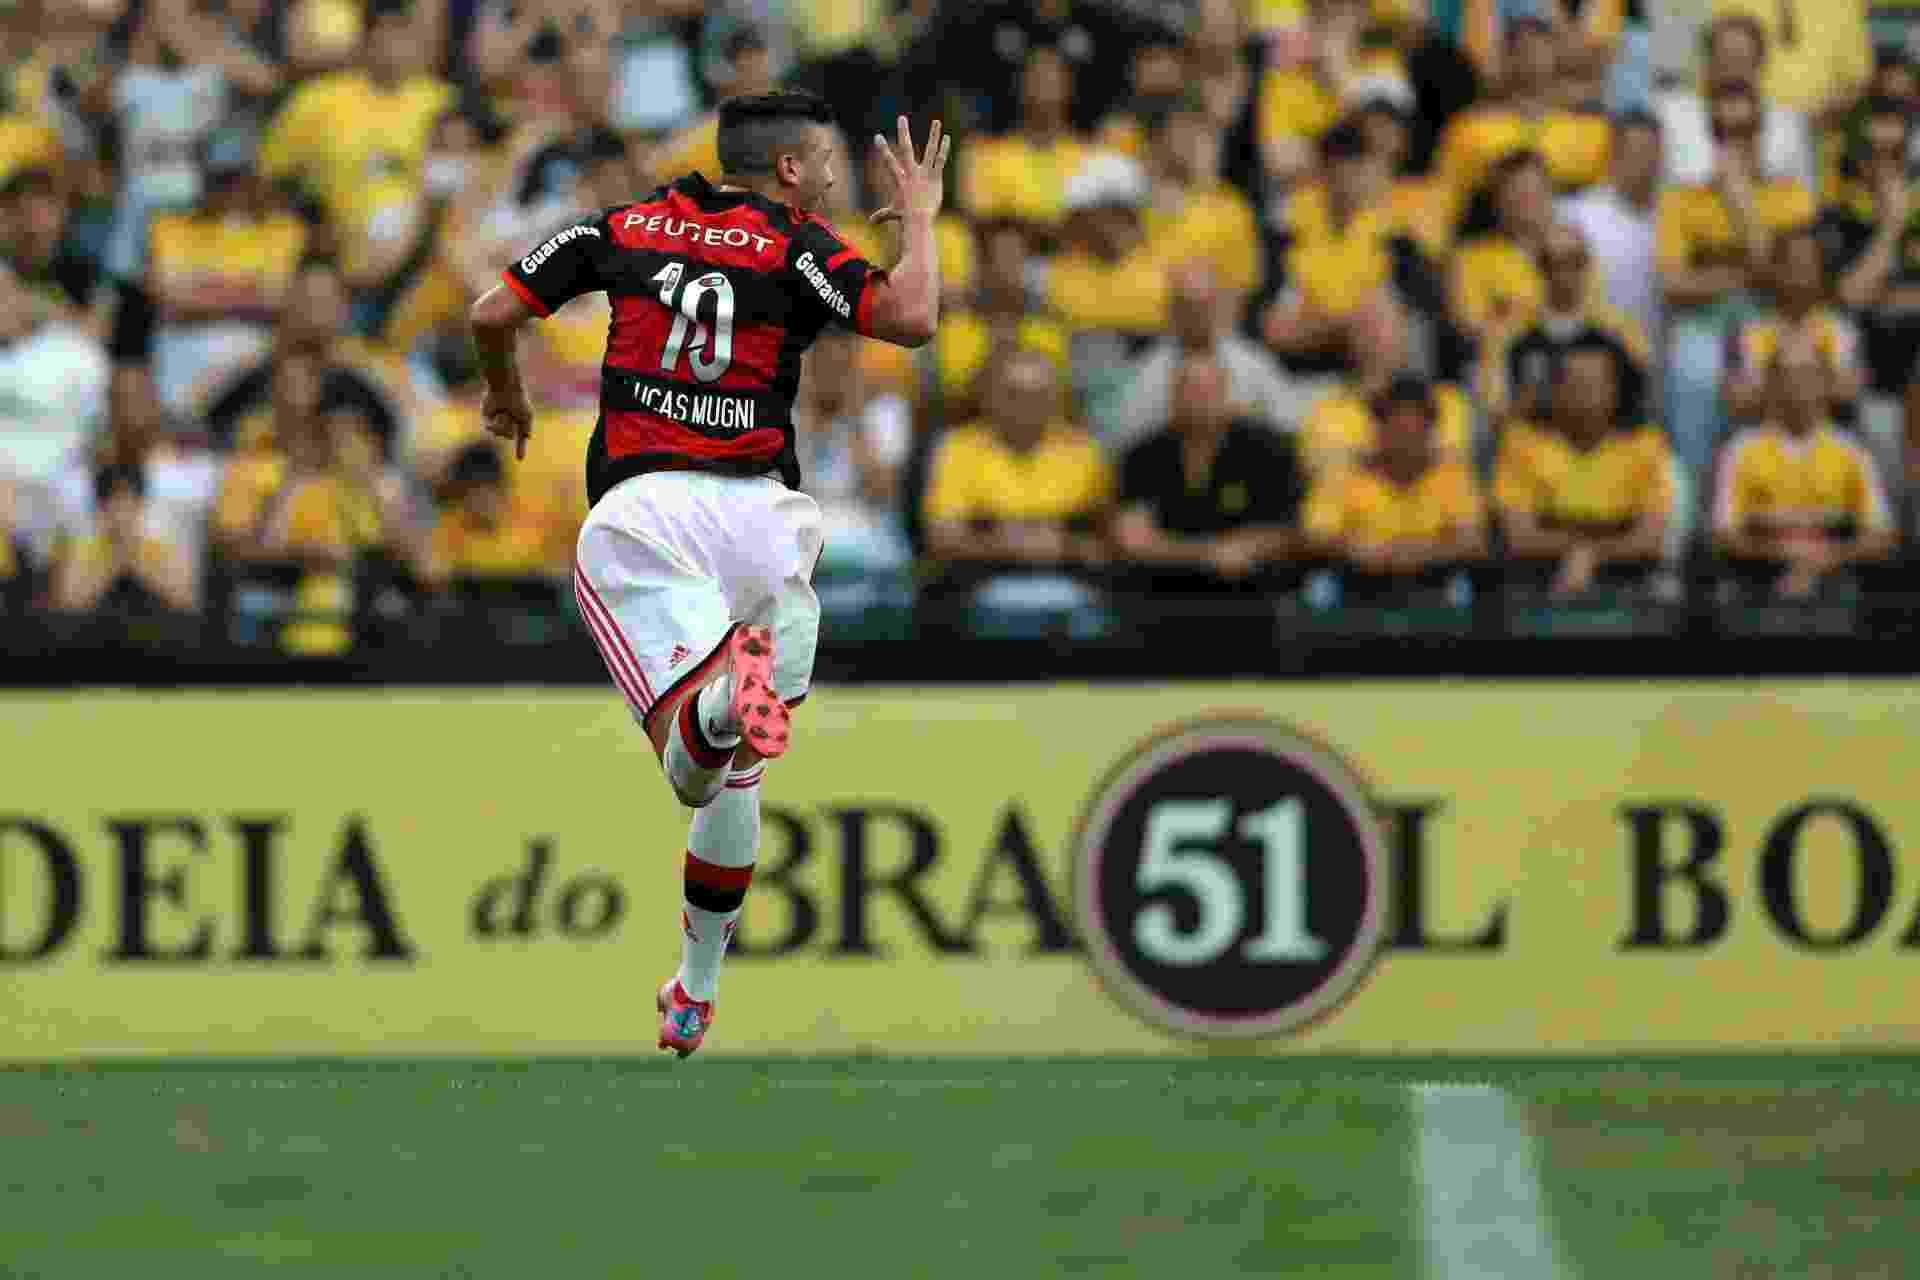 Lucas Mugni comemora após marcar gol de pênalti pelo Flamengo - Getty Images